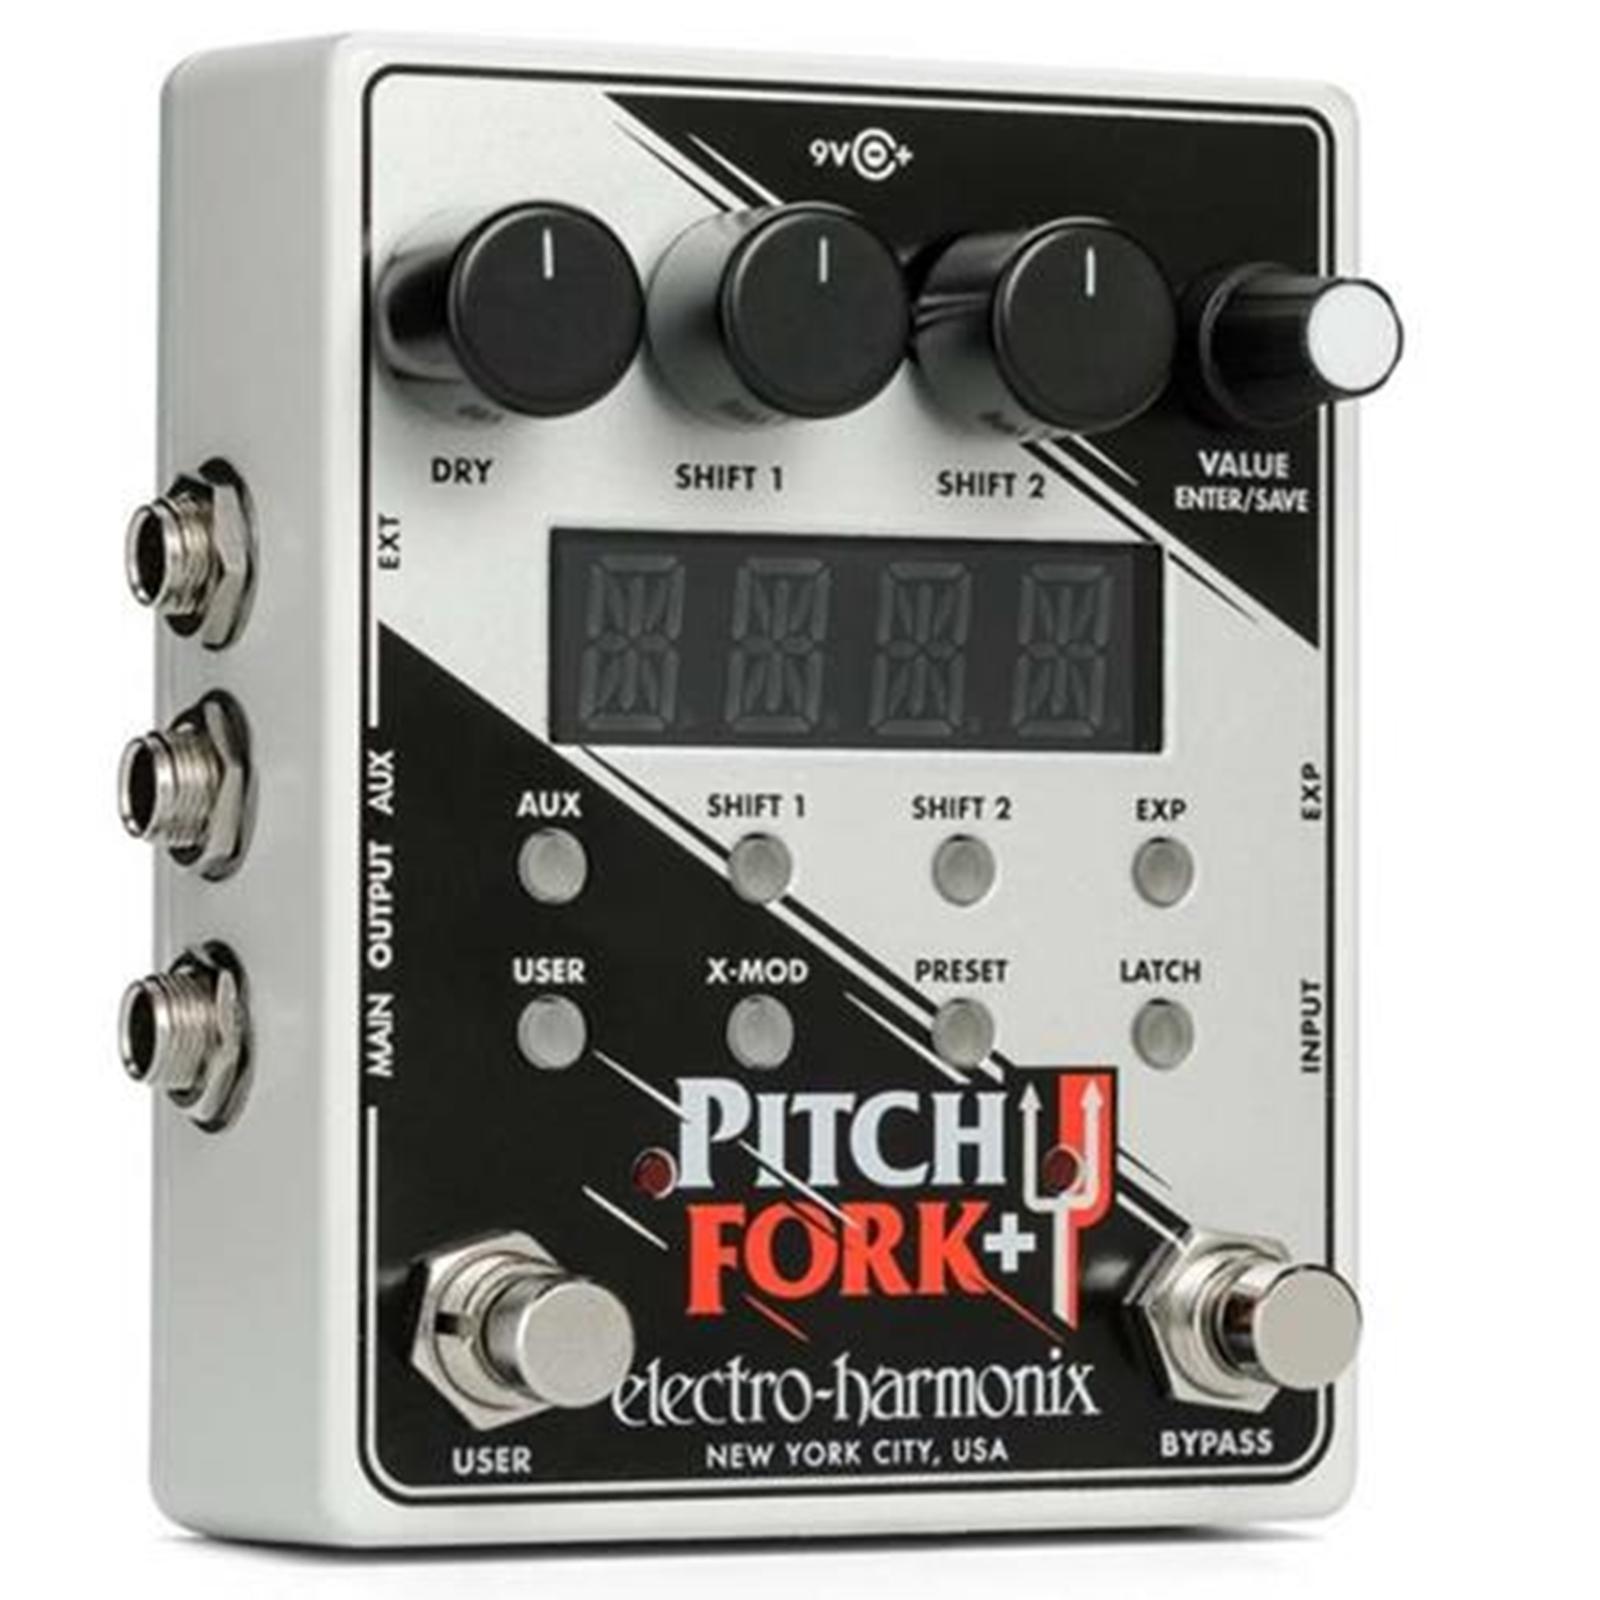 Electro-Harmonix Pitch Fork + Polyphonic Pitch Shift Pedal